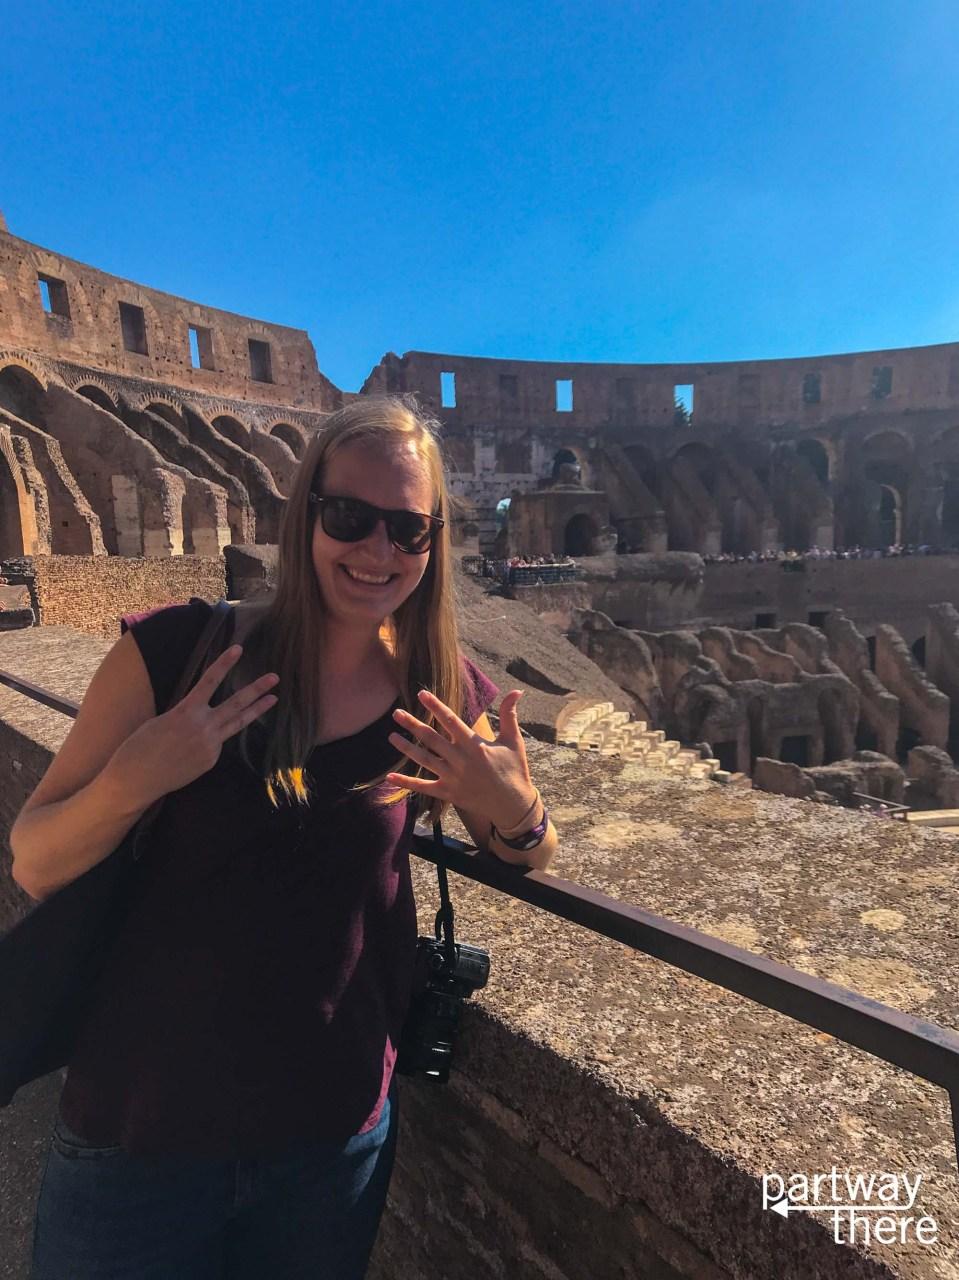 Amanda Plewes at the Colosseum